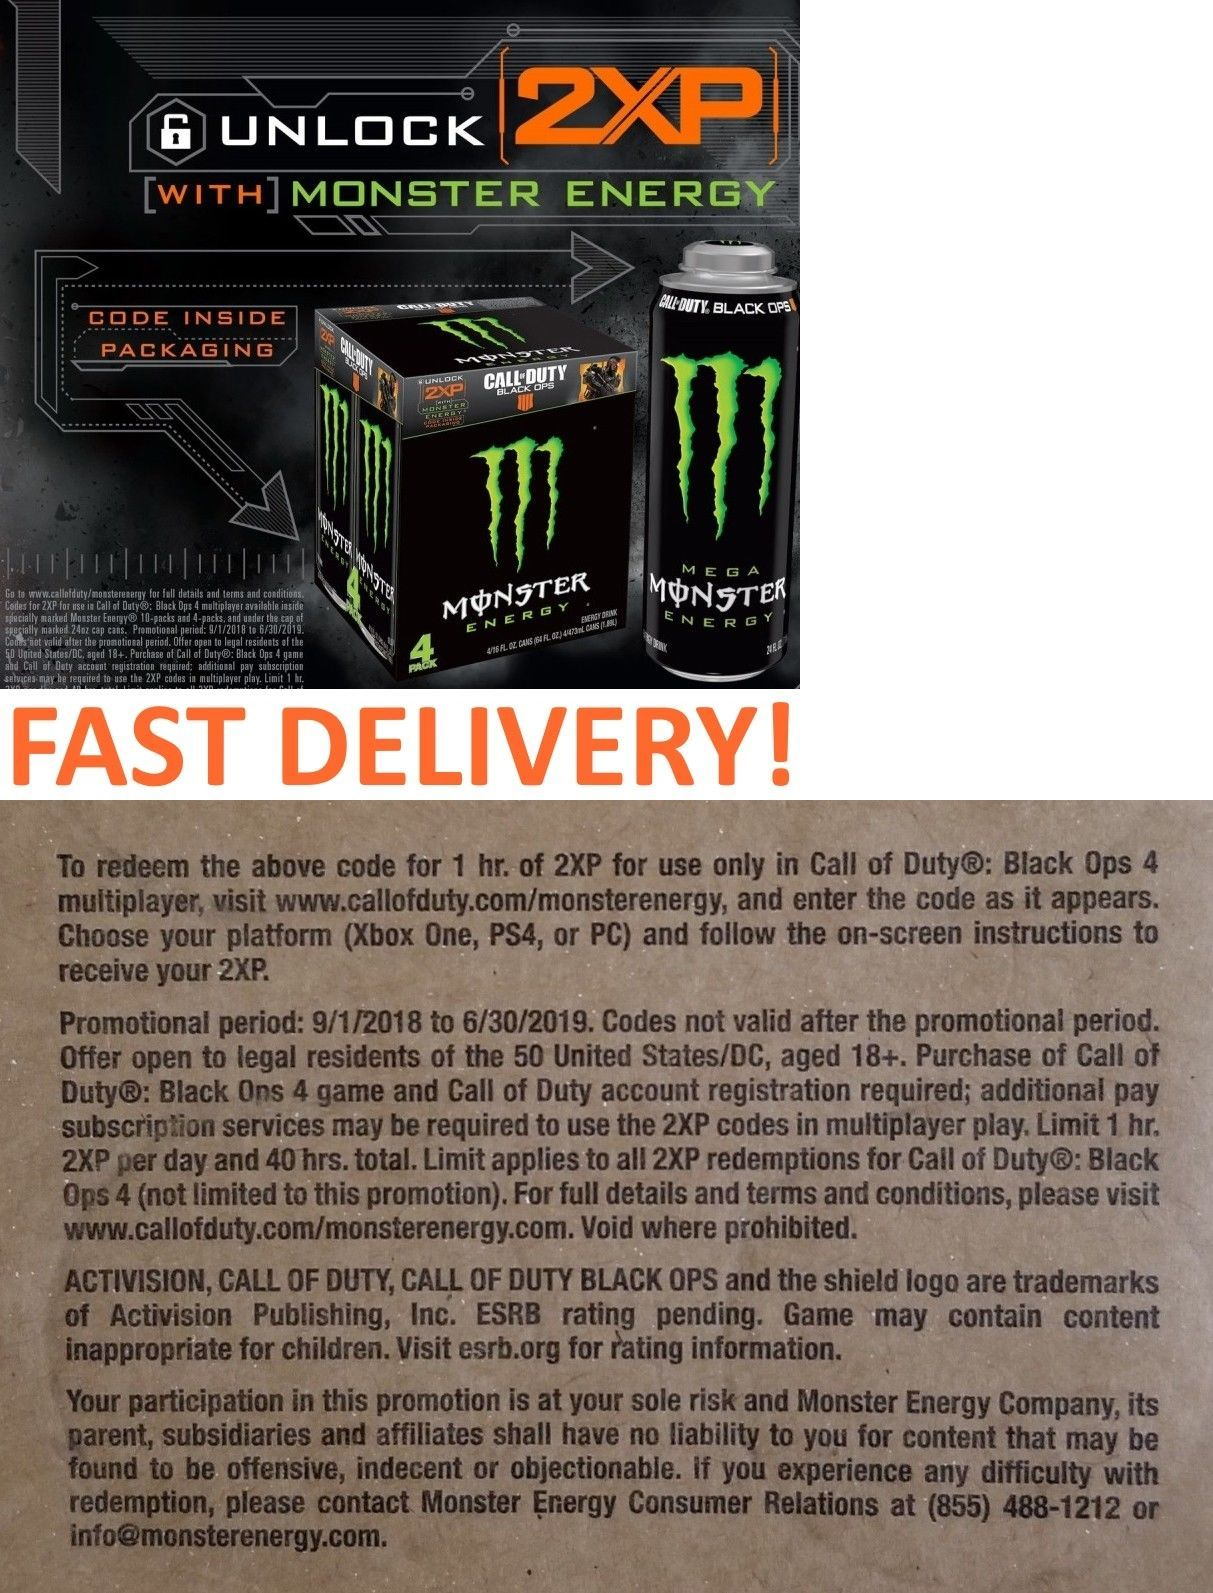 call of duty black ops 4 monster energy